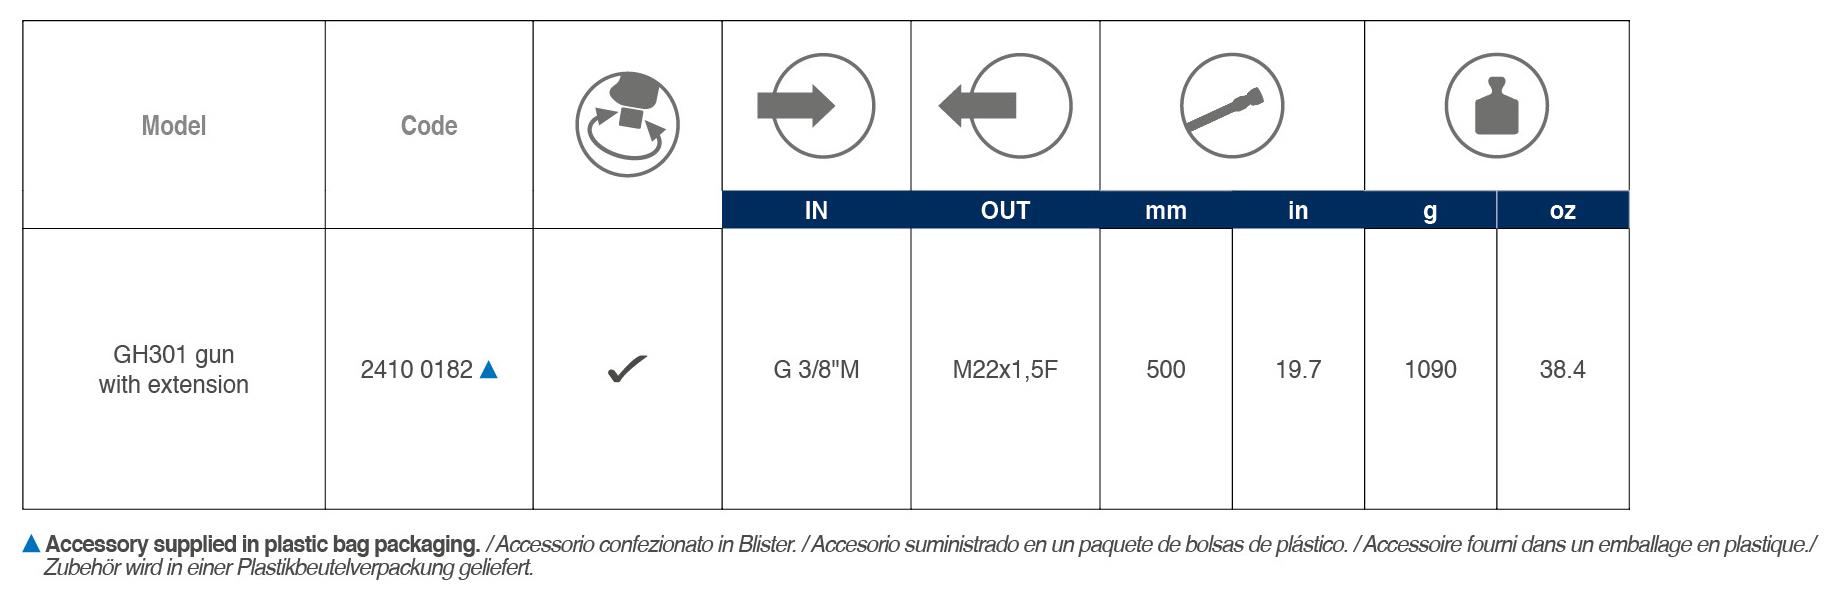 GH 300 tabelle 02